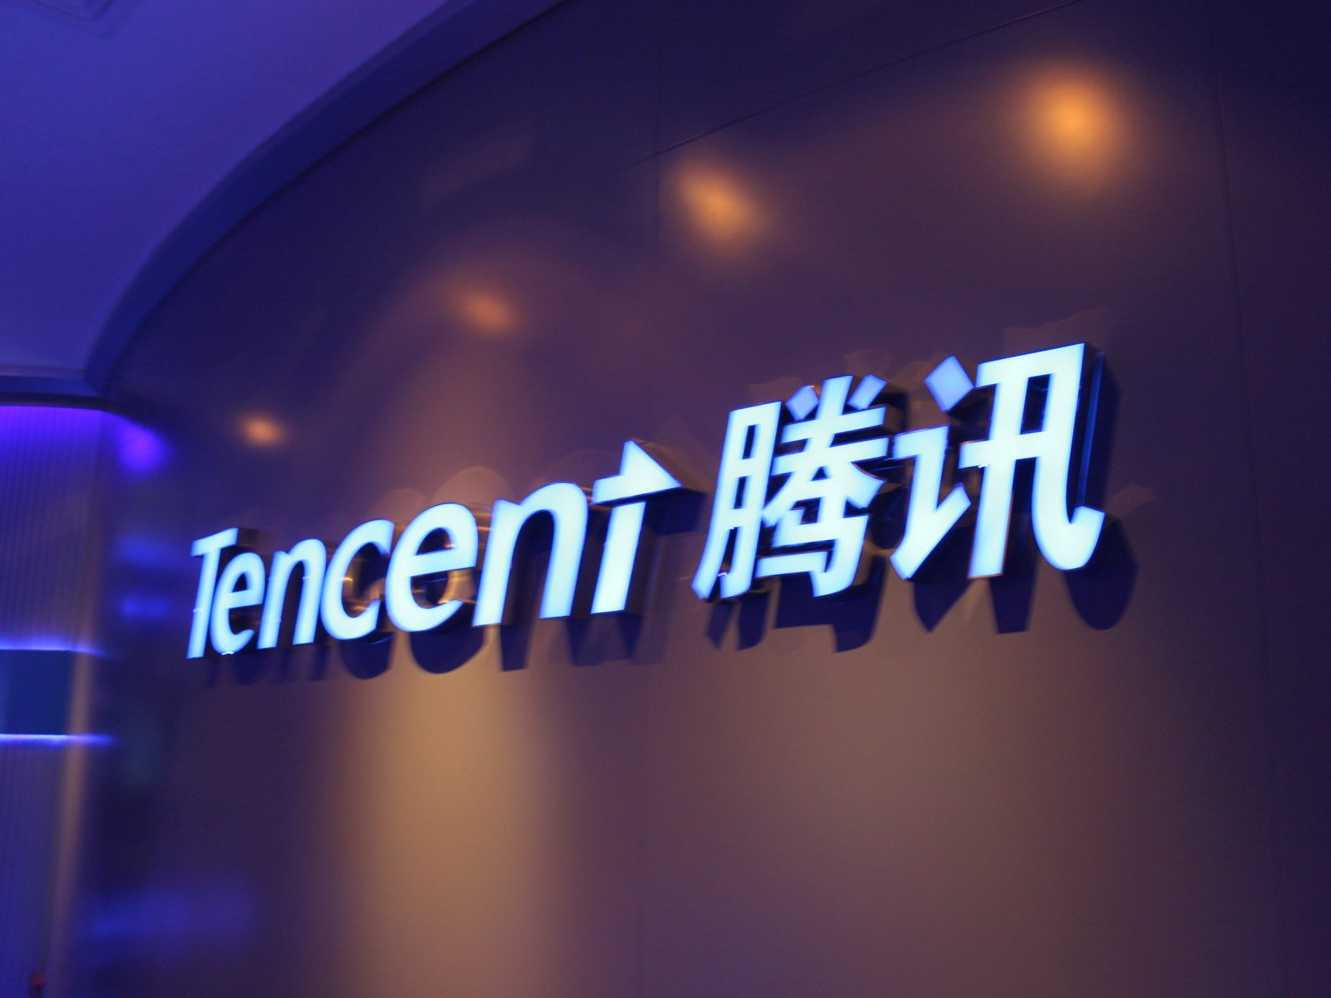 Tencent's logo